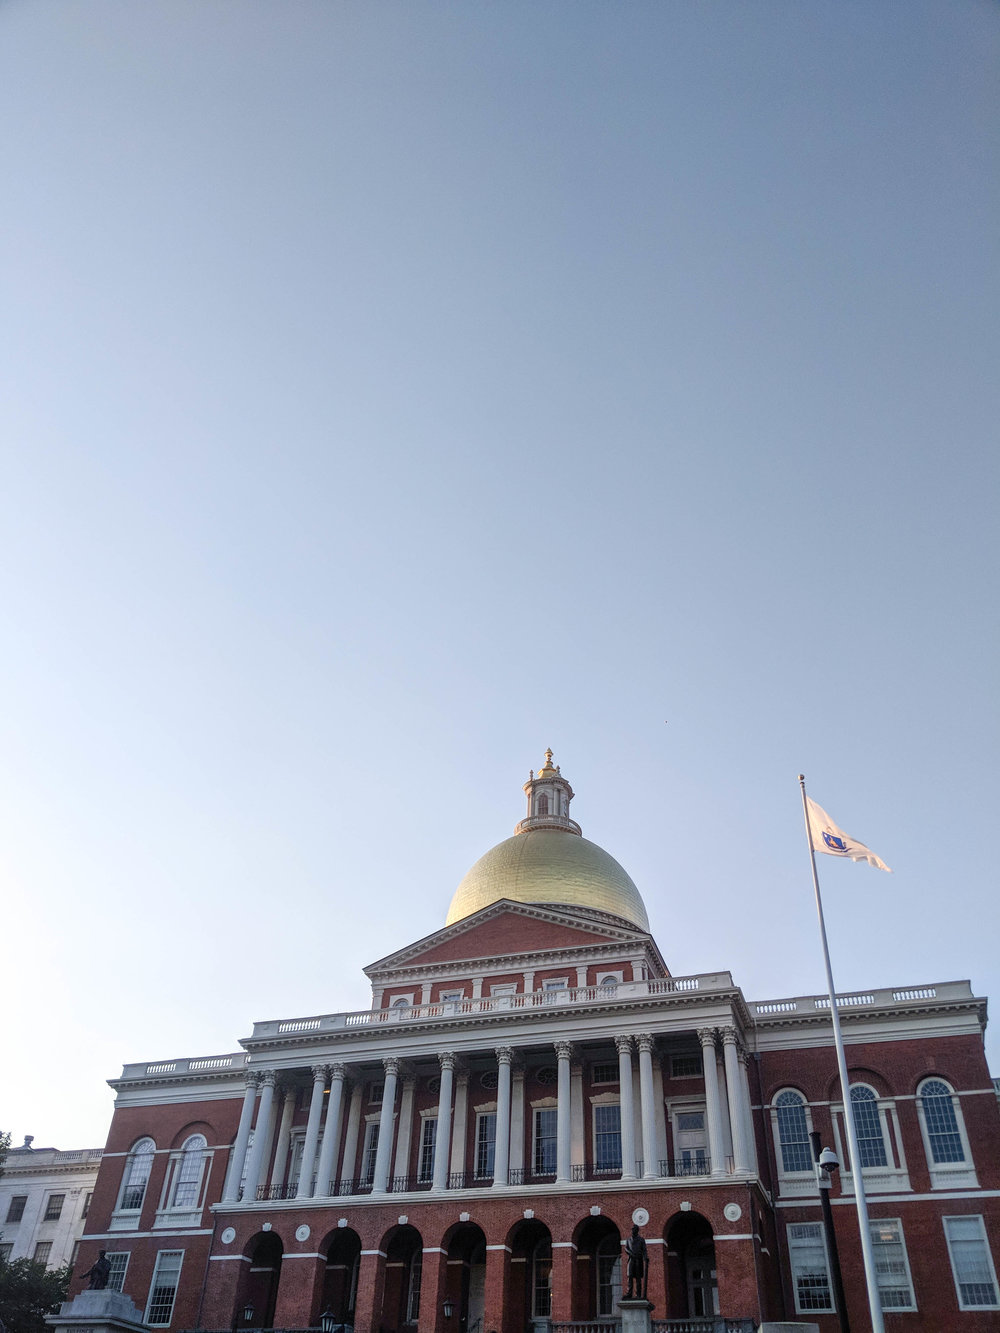 bri rinehart; photography; state house; boston